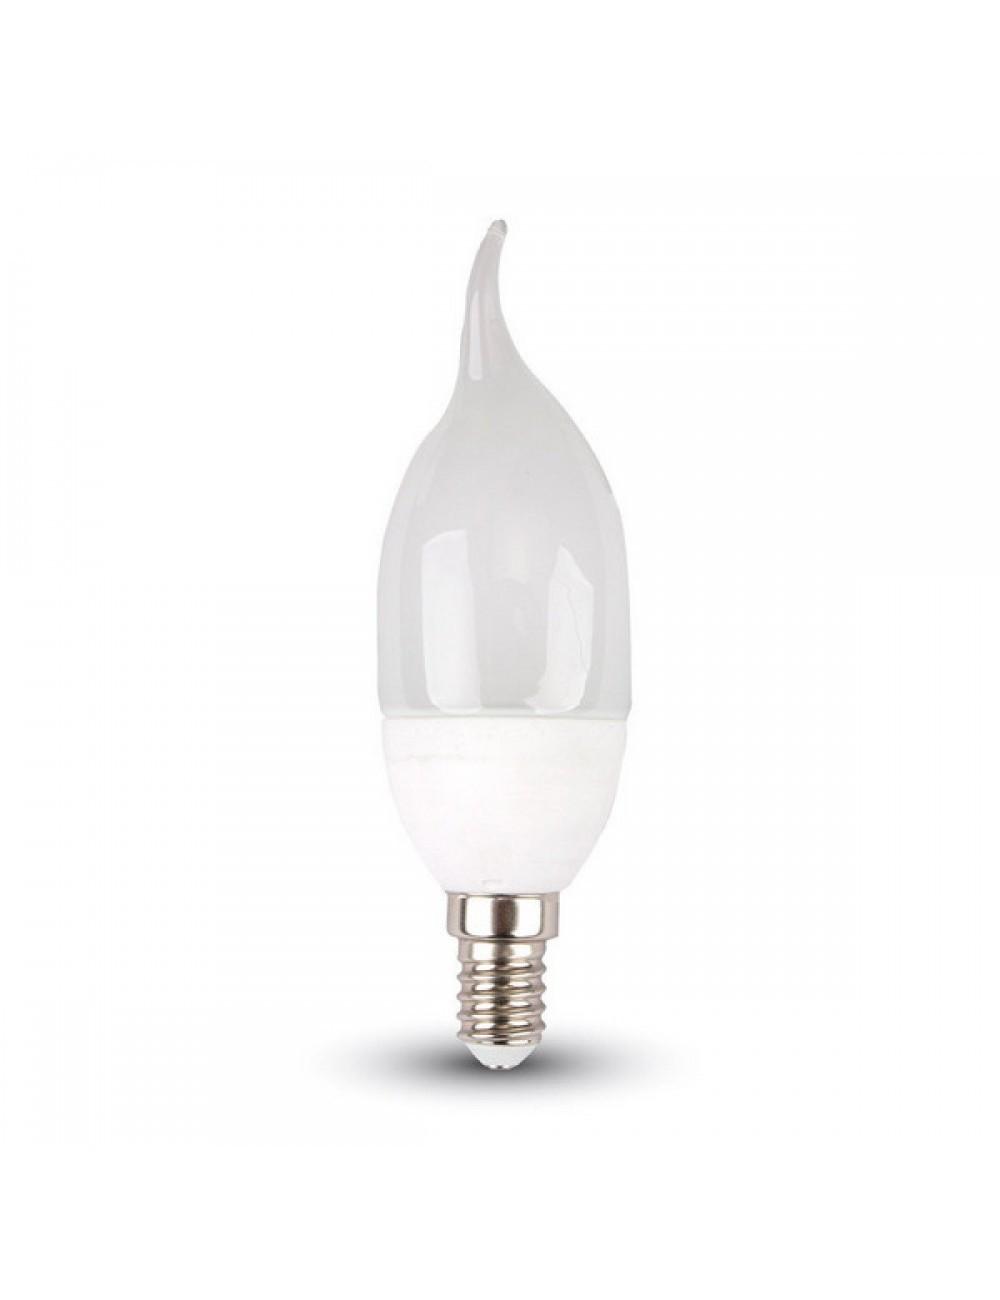 Lampadina Lampada Fiamma Led 4W Luce Bianca Fredda 2700 K Attacco E14 320 Lumen